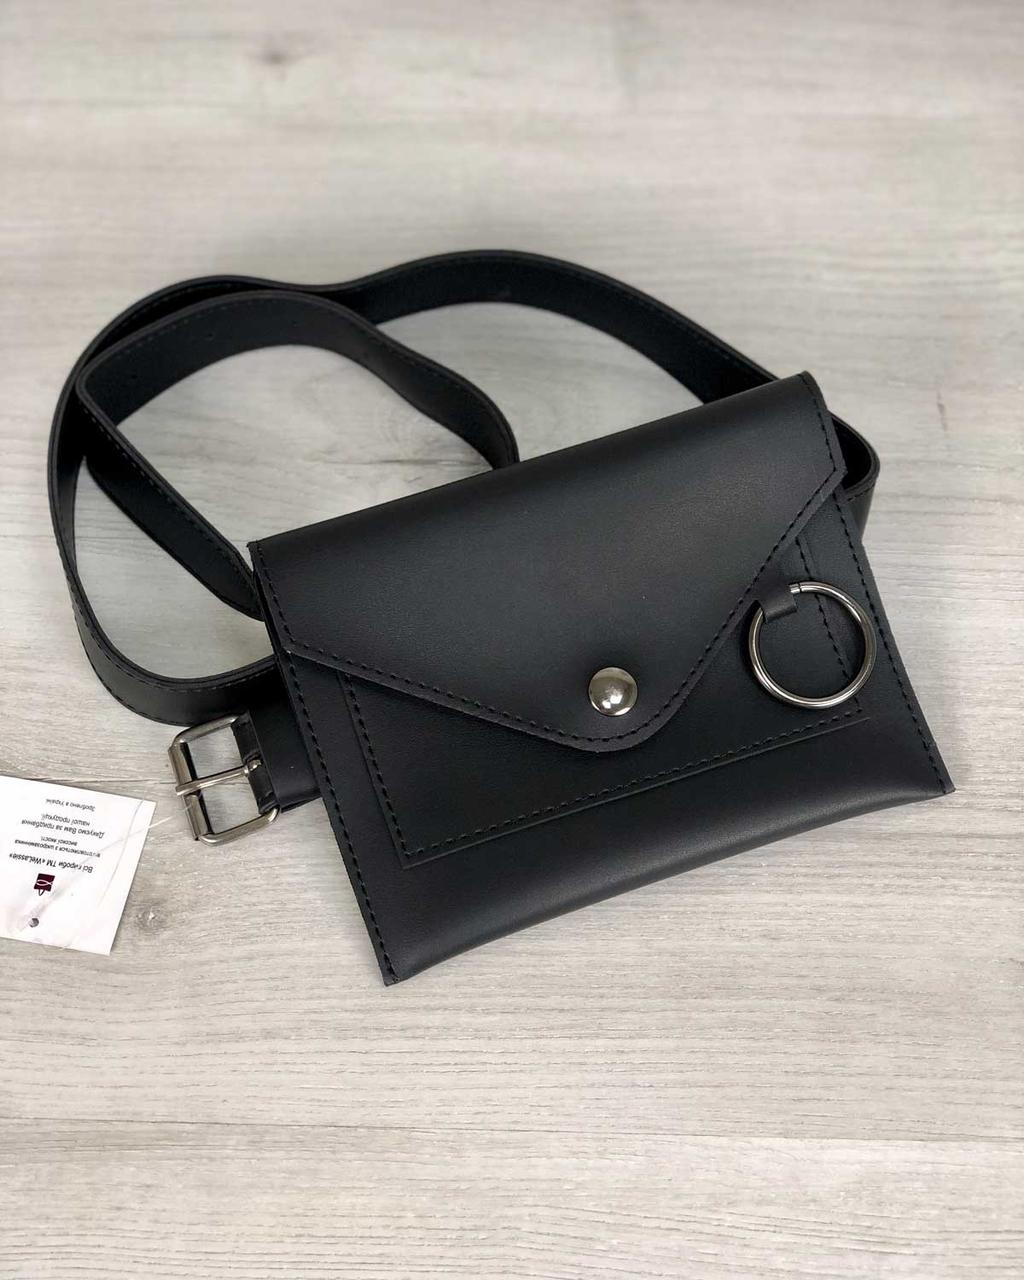 Молодіжна сумка на пояс чорна жіноча стильна